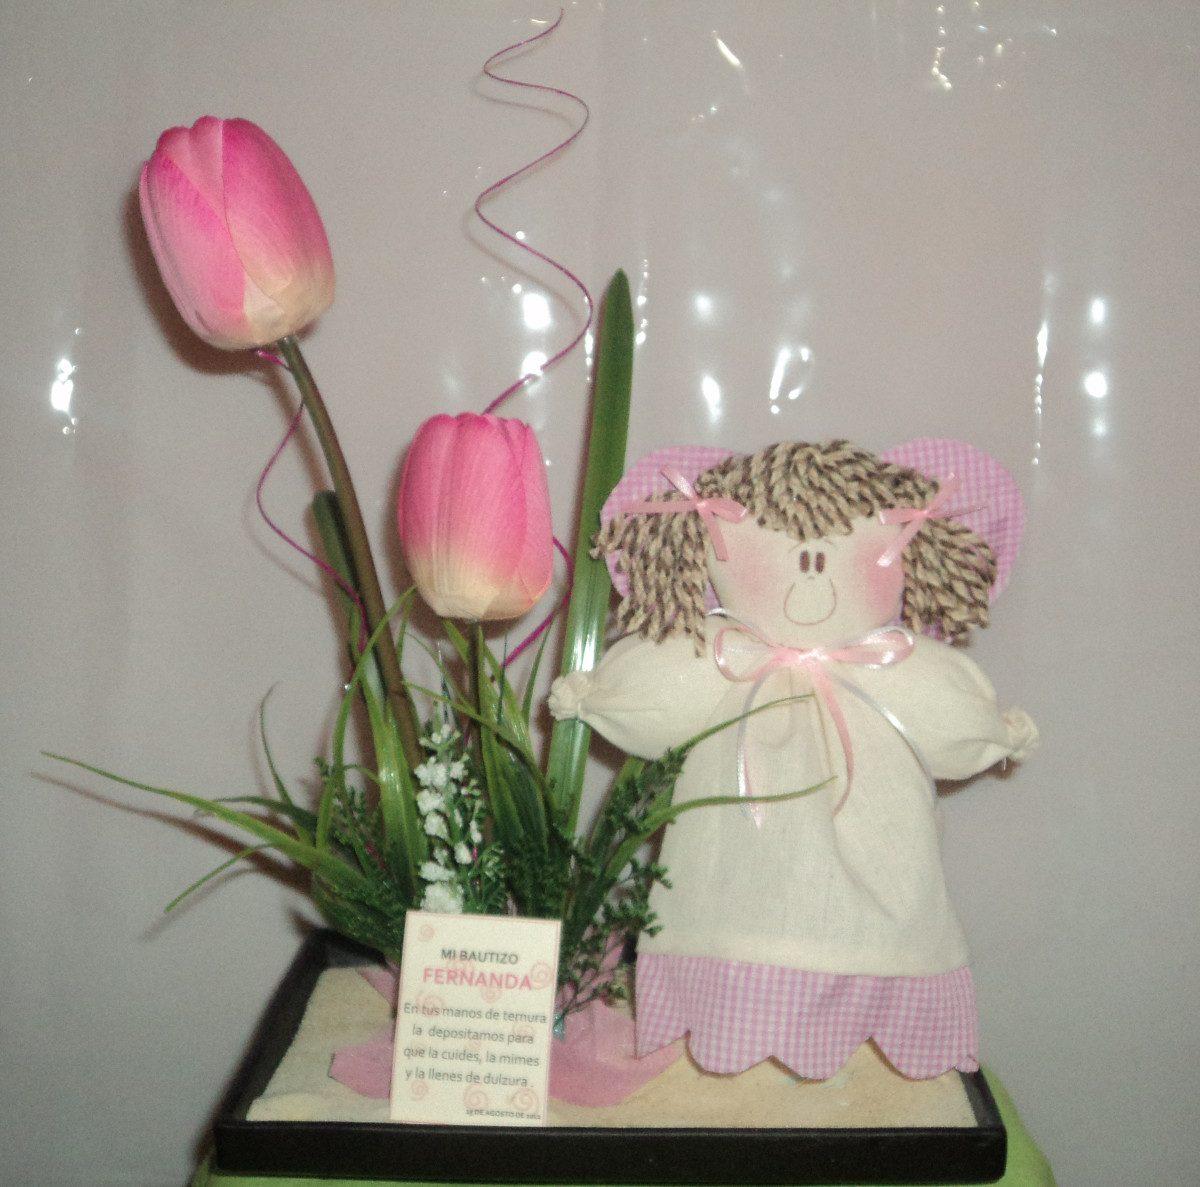 1000 images about souvenirs para toda ocasi n on - Centros d mesa ...